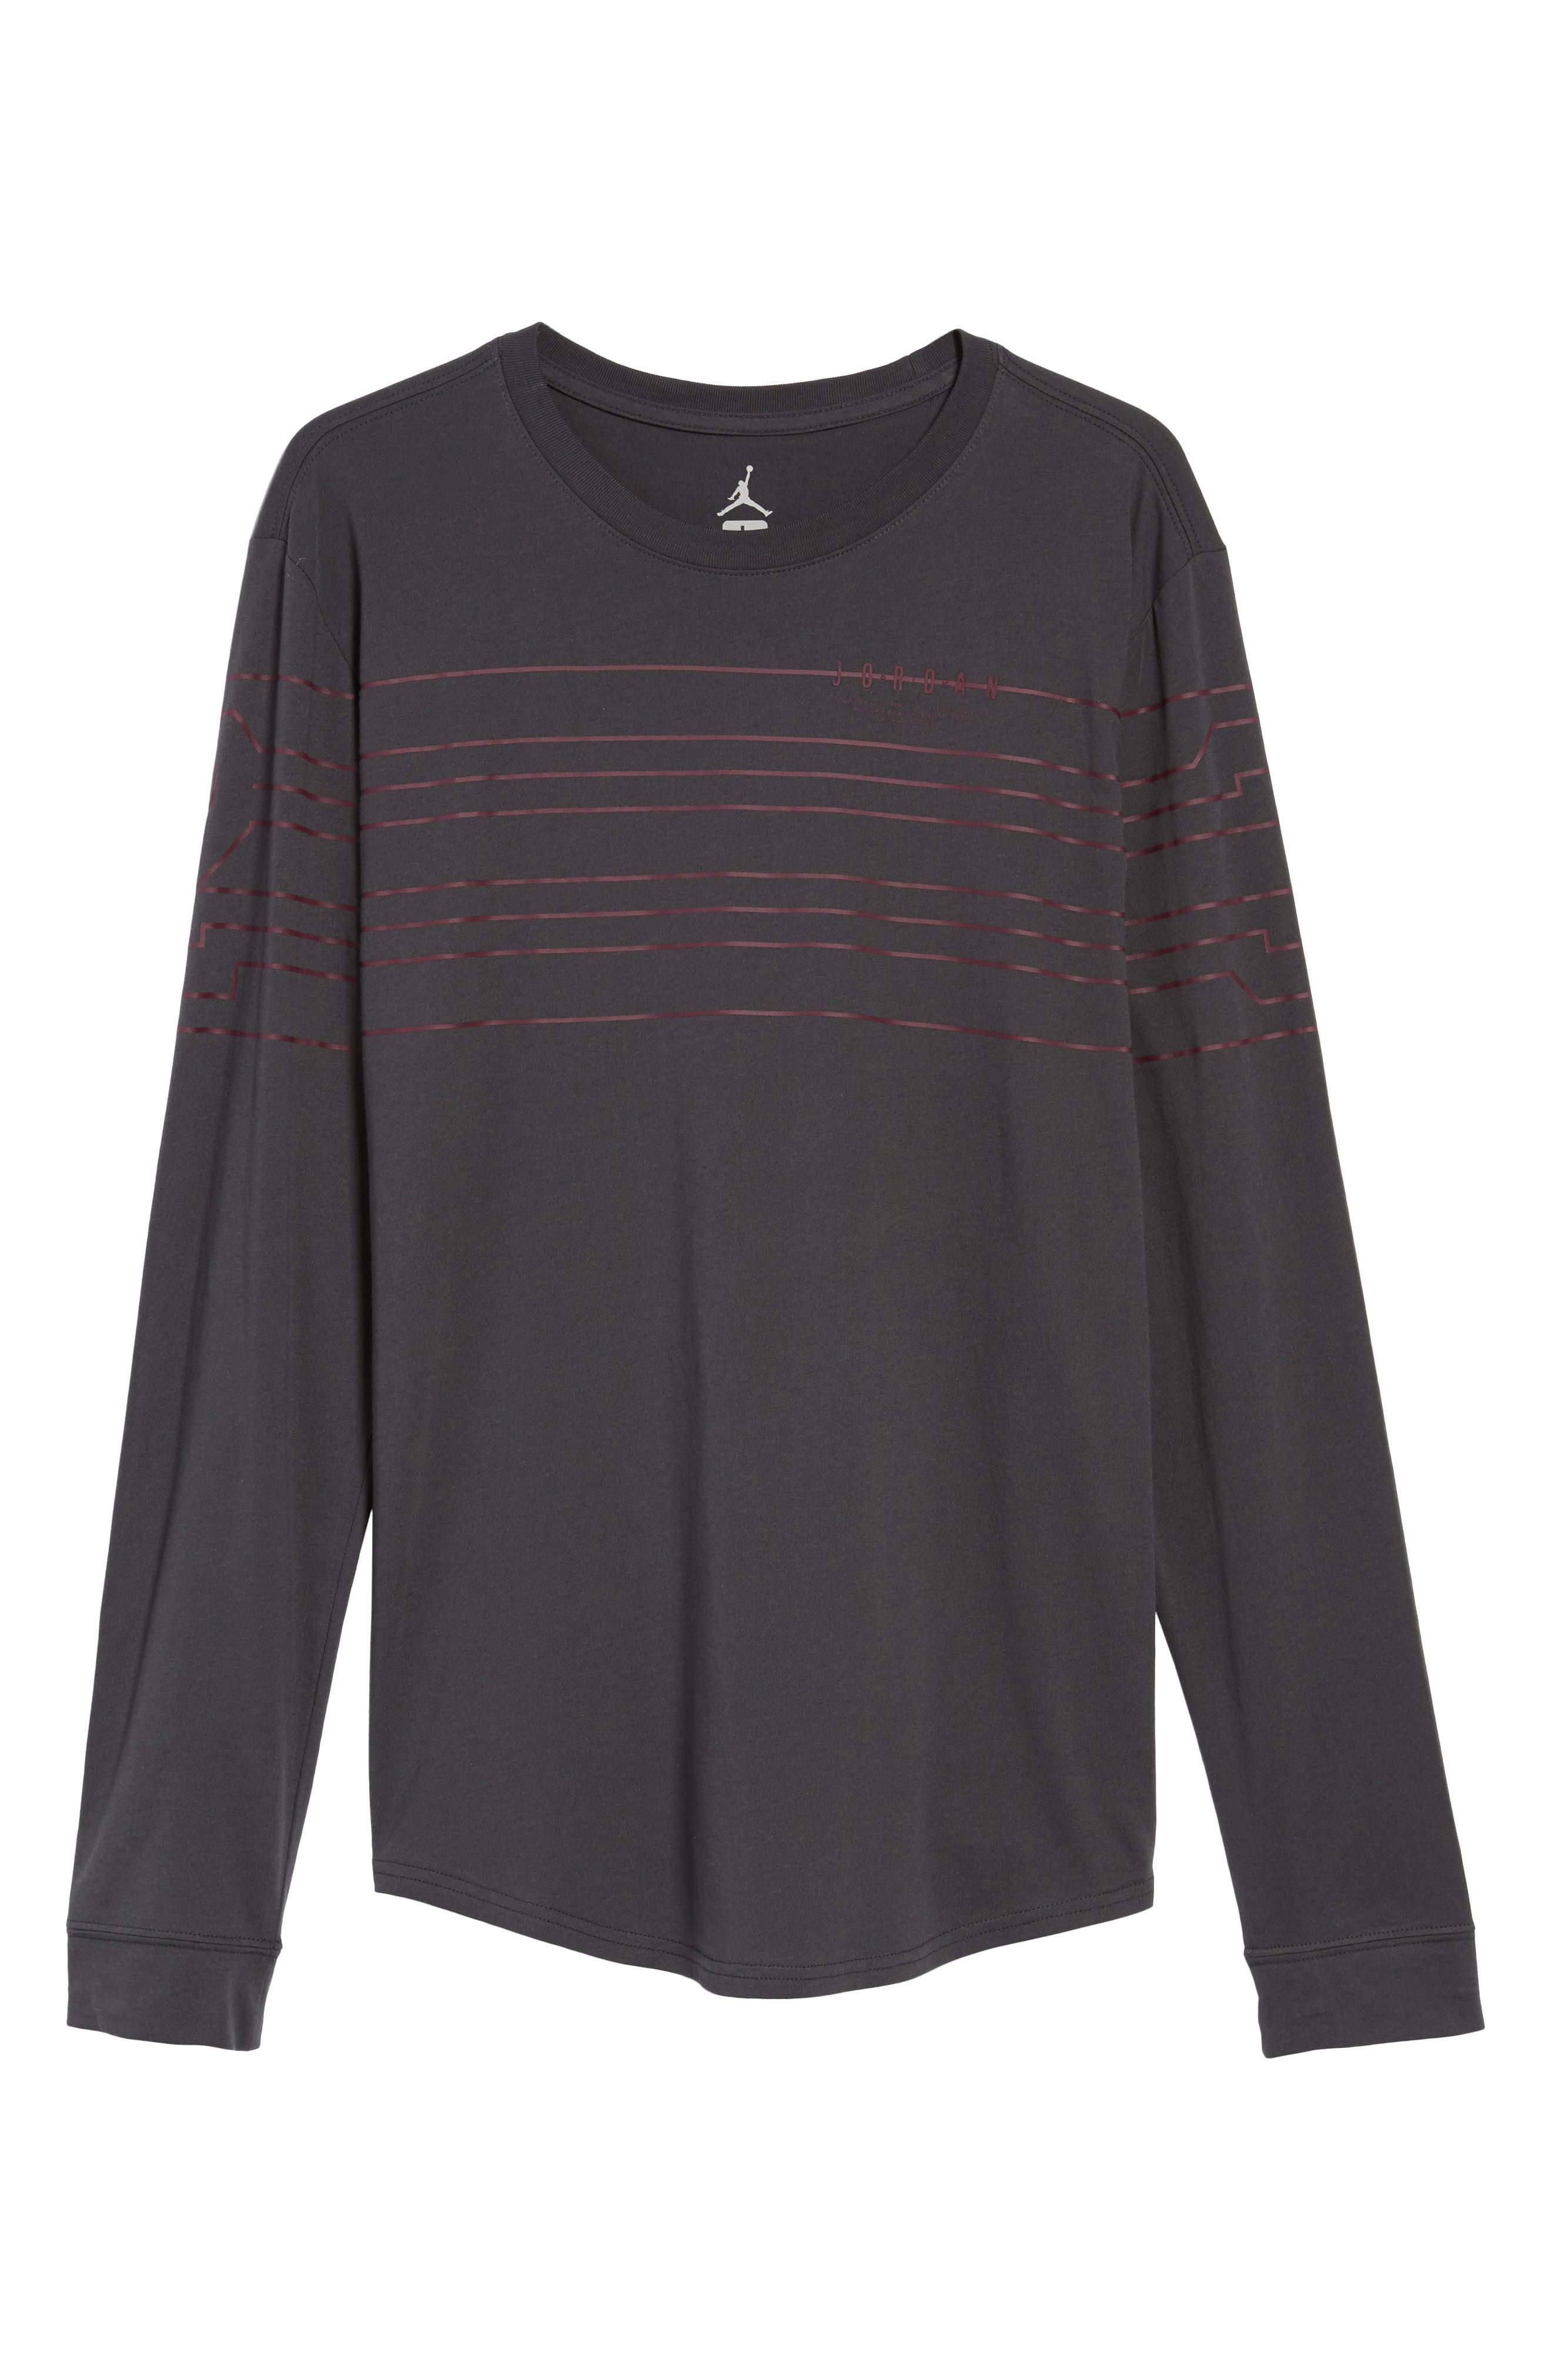 Sportswear 23 T-Shirt,                             Alternate thumbnail 11, color,